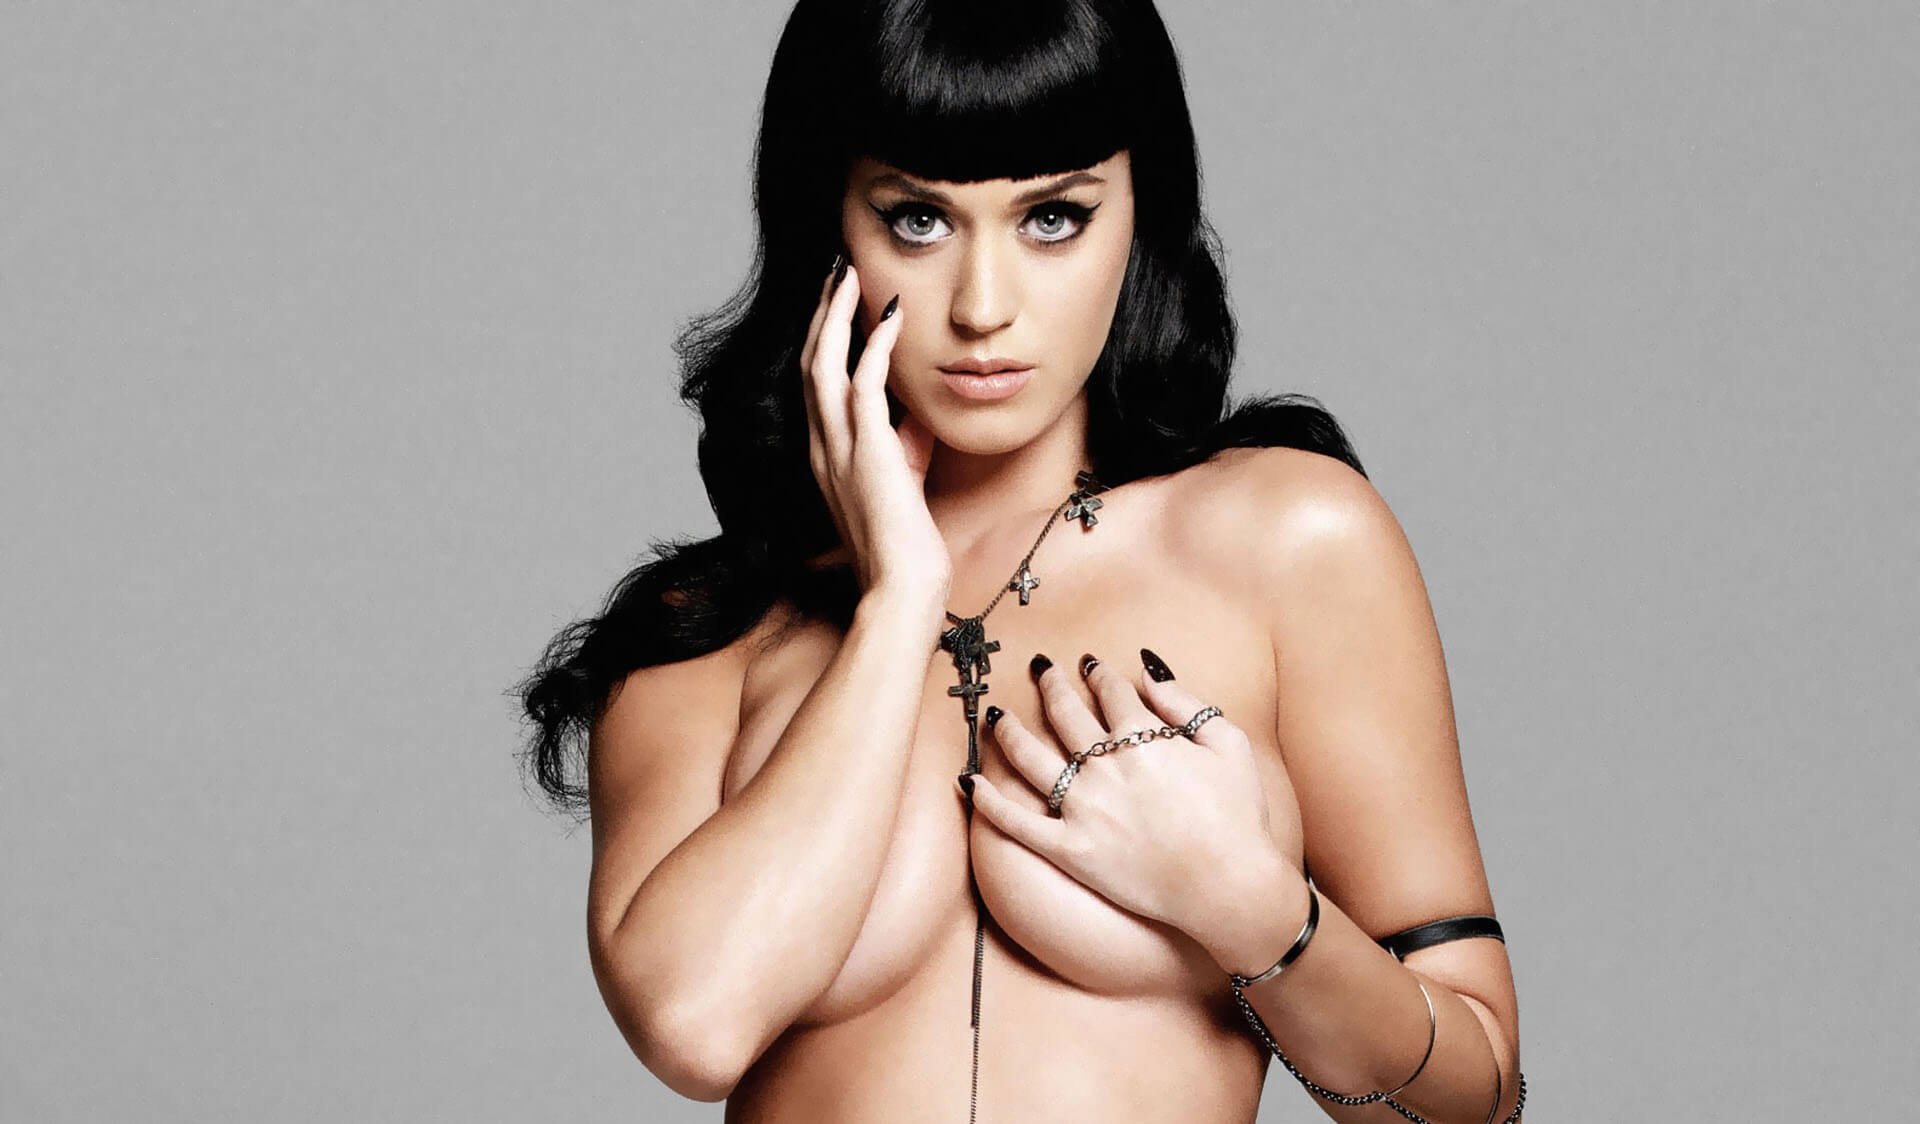 Katy Perry nude pics (2)